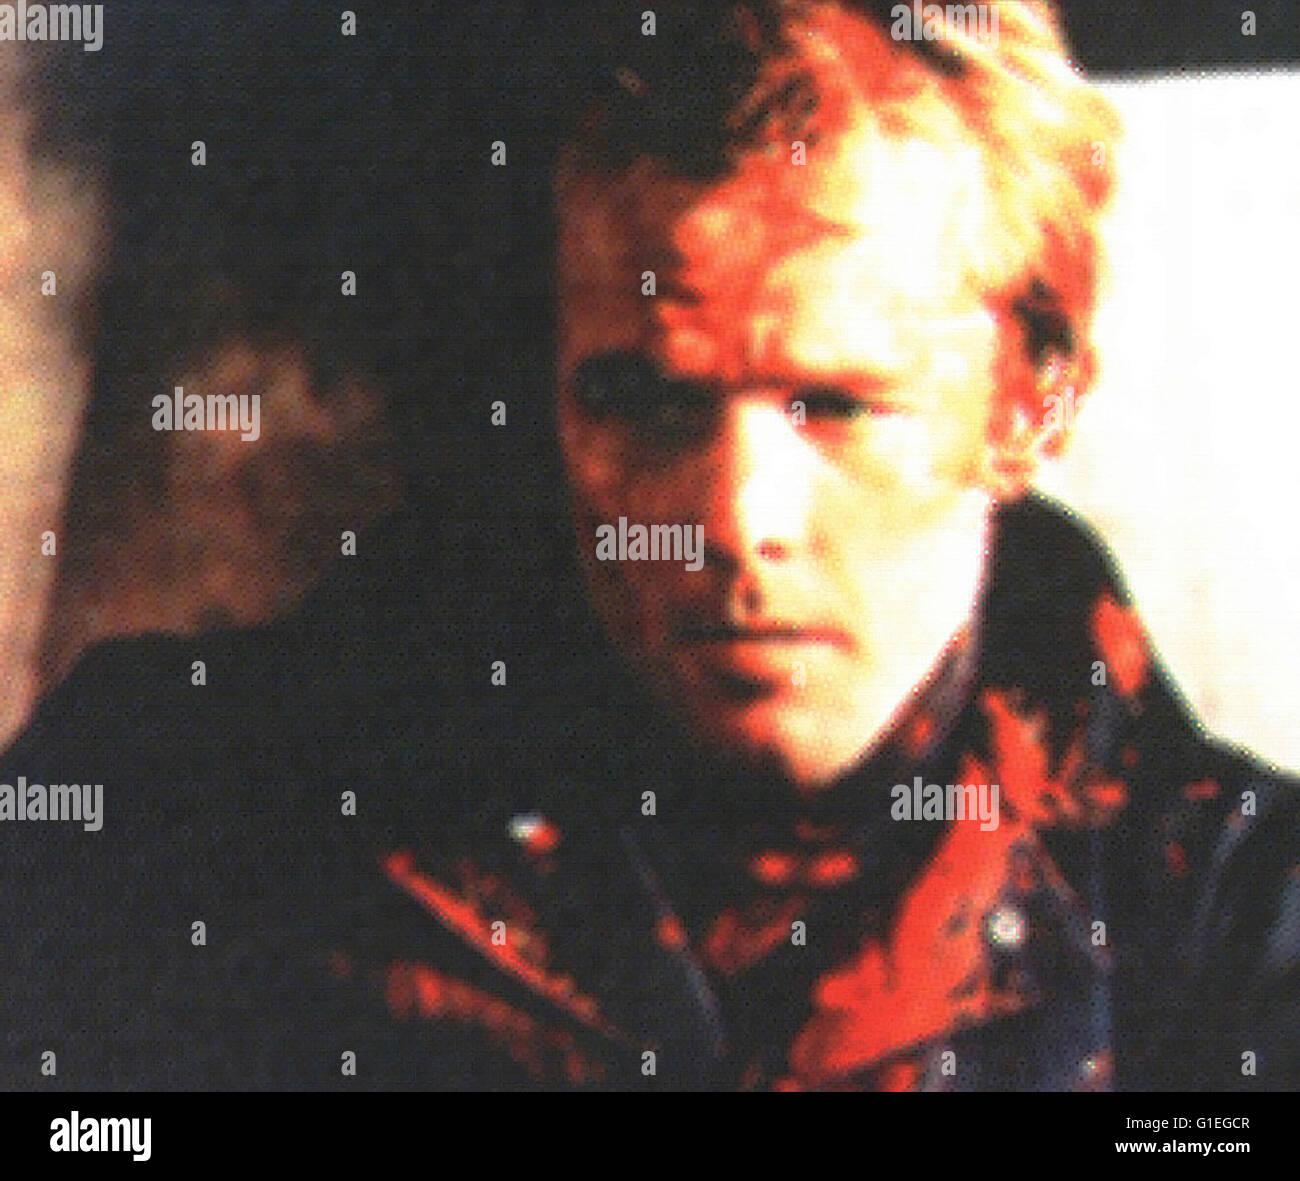 ZombieOriginal x 2 cm Bild auf Cover-Rückseite Immagini Stock